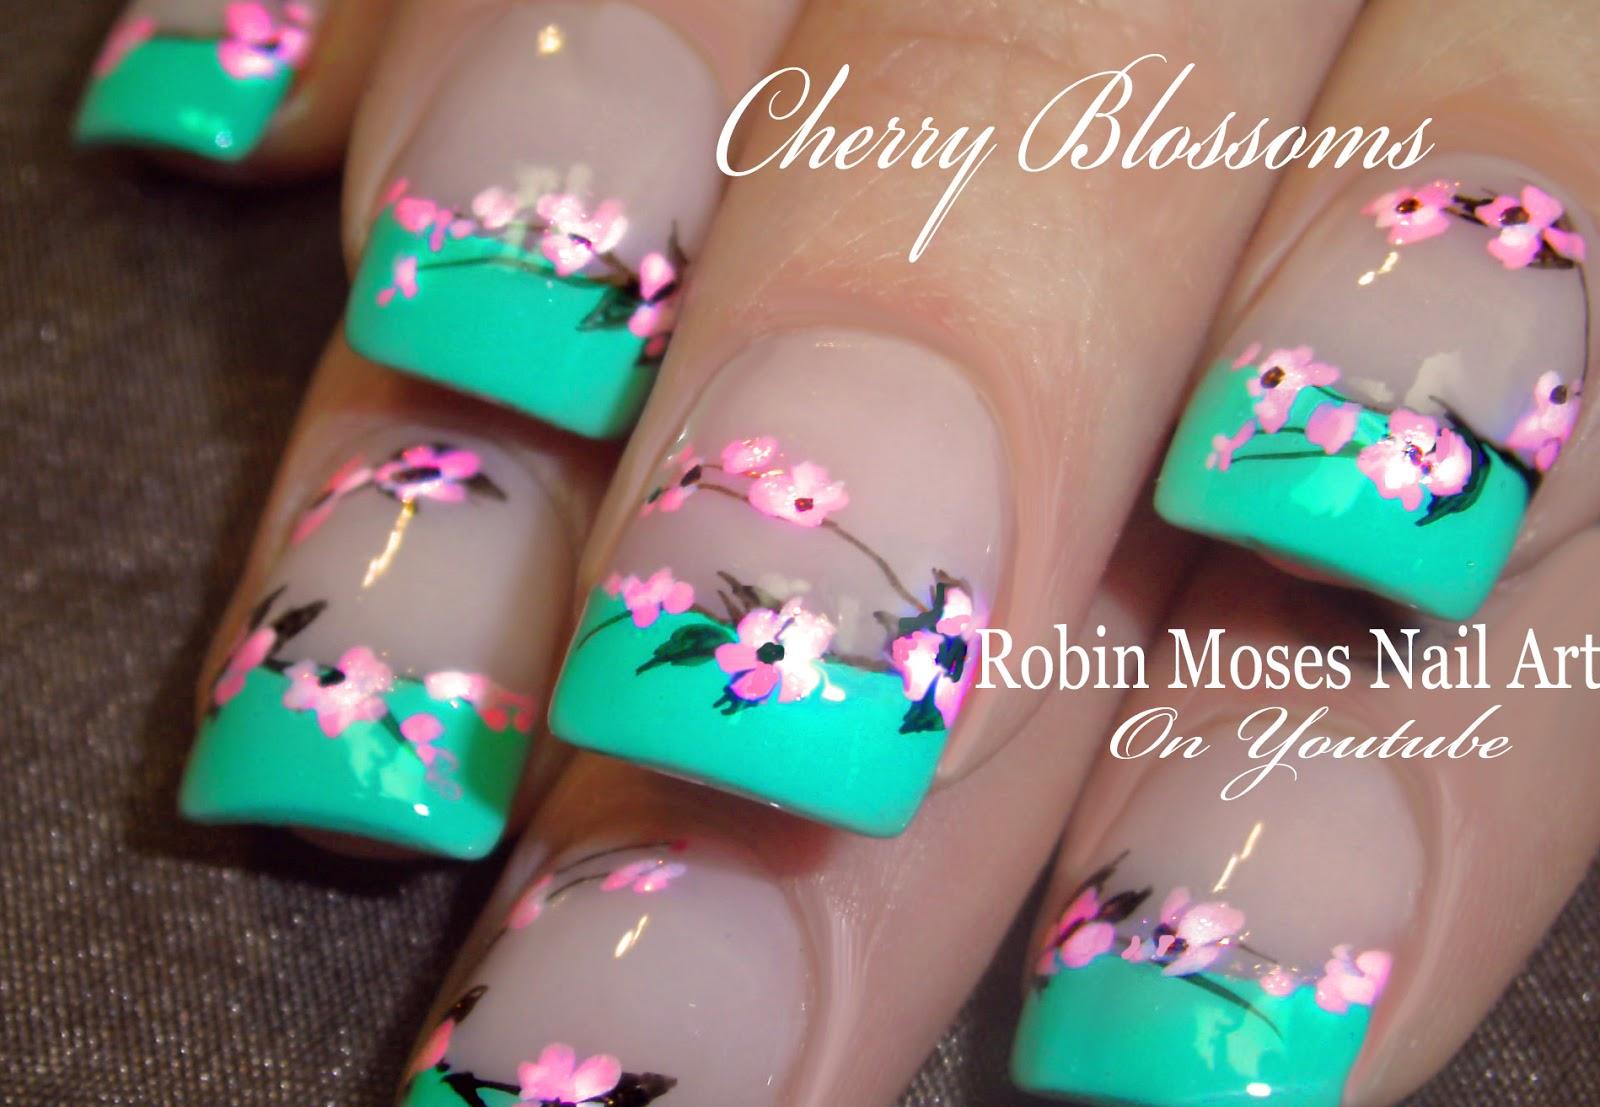 Cherryblossomsminttipspinkneonspringg springnails2018 spring nailart nails robinmoses springnaildesign spring2018 prinsesfo Choice Image